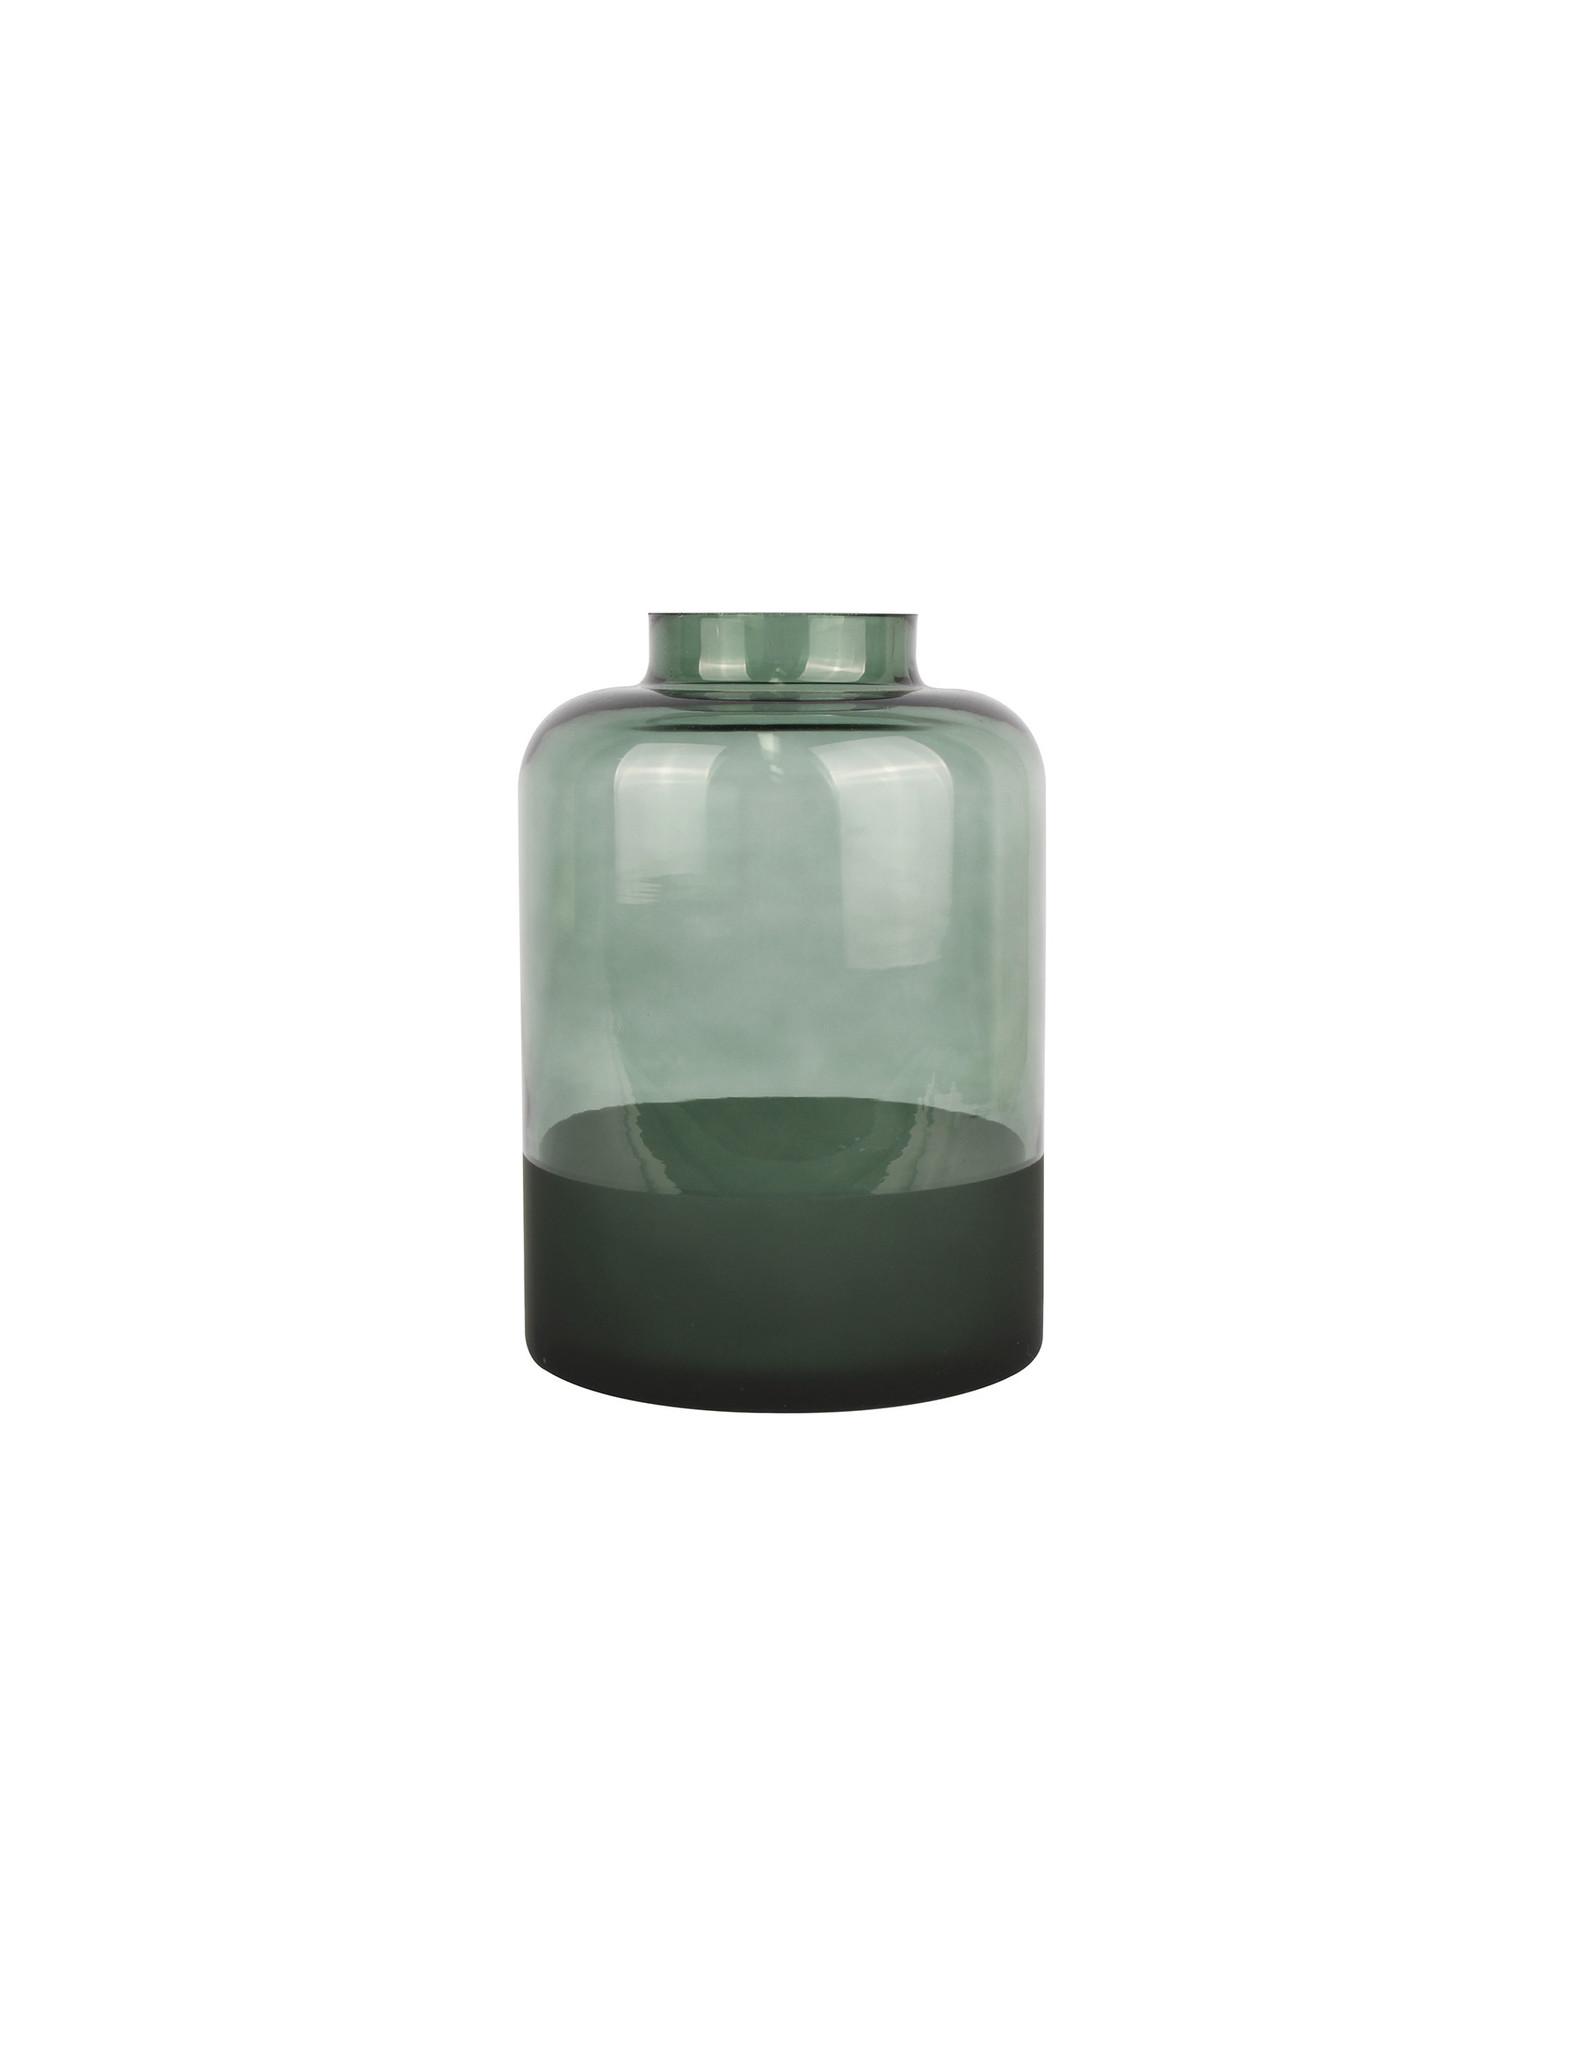 Groene Glazen Vaas.Donkerblauwe Vaas Majestic Te Koop Op Www Yellowsky Shop